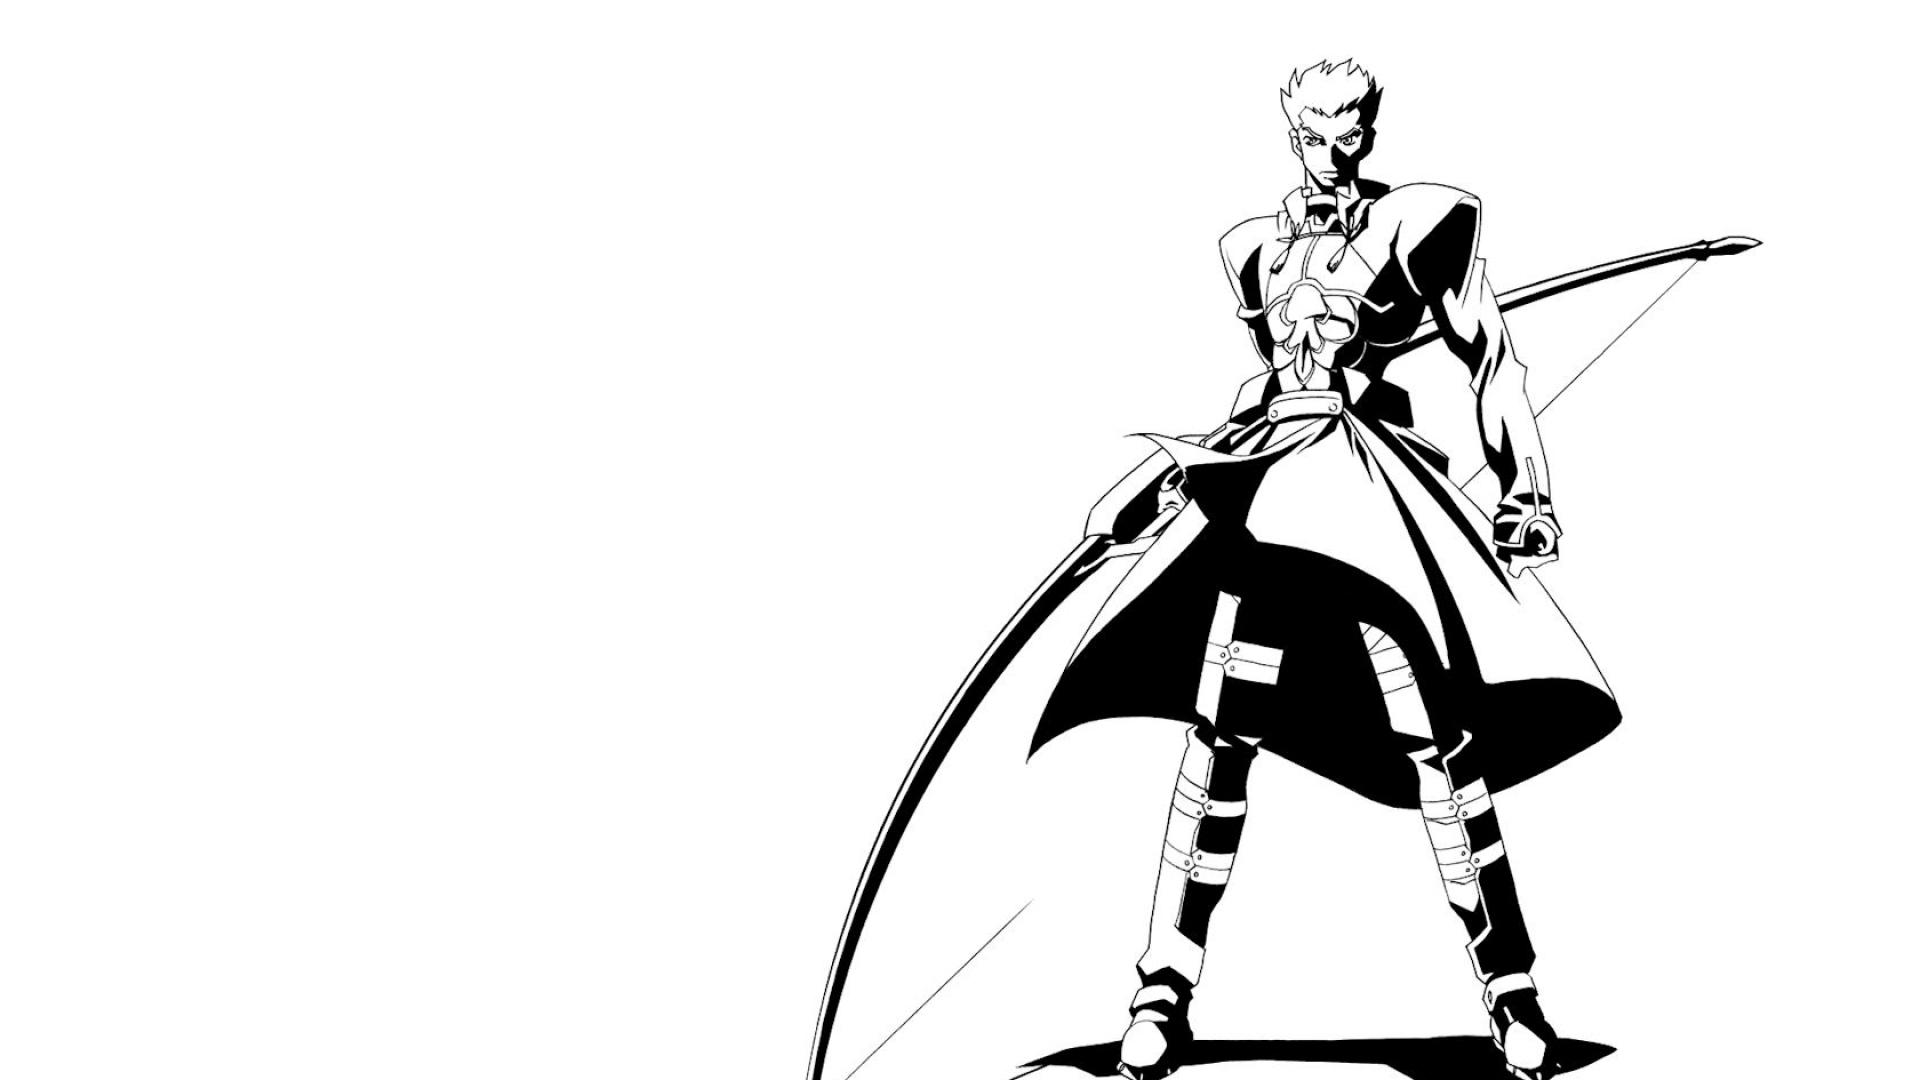 anime, boy, black and white